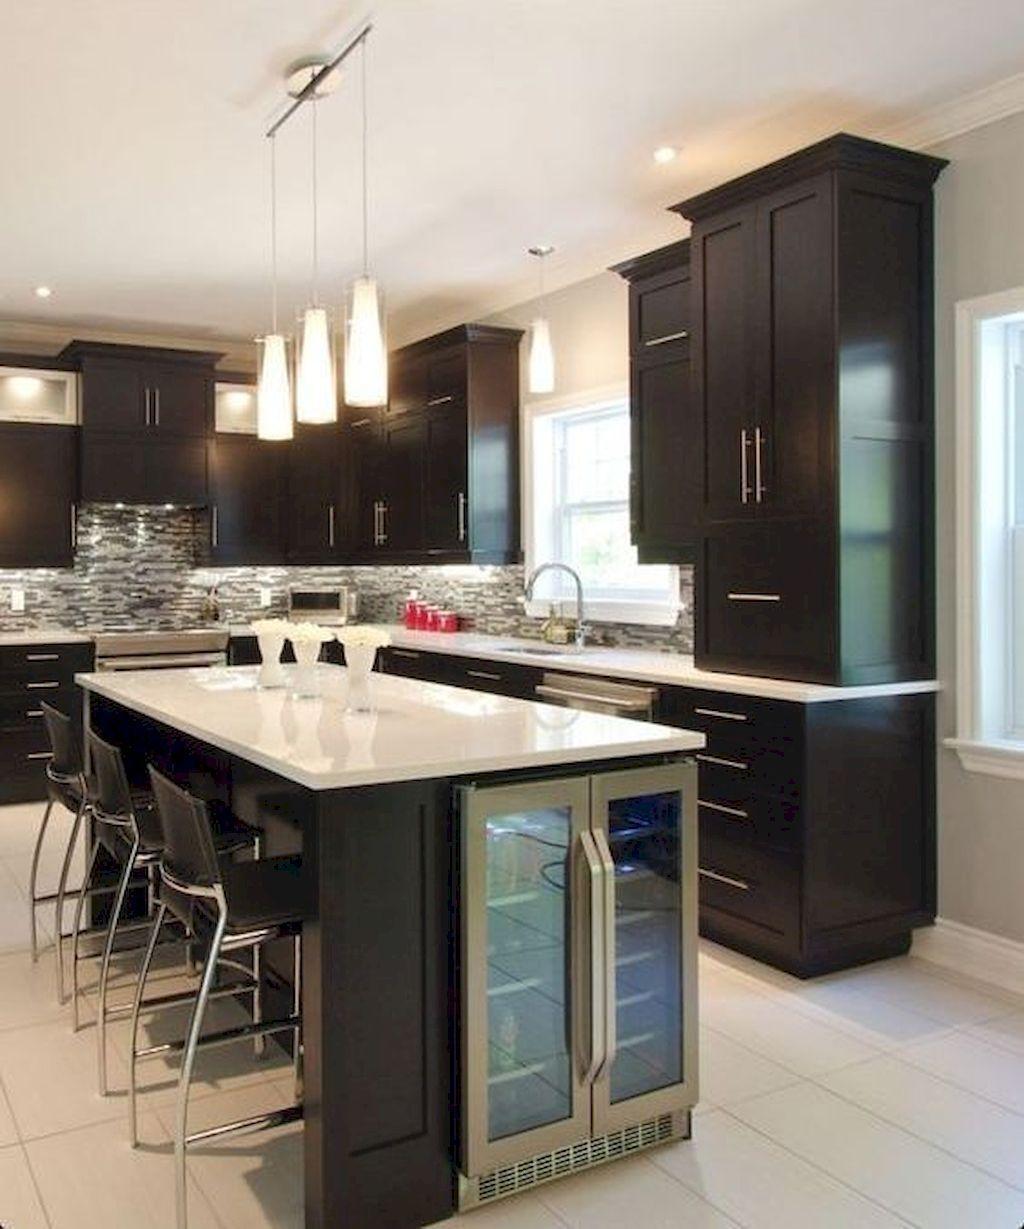 50 Kitchen Island Design Ideas With Marble Countertops Sweetyhomee Diy Kitchen Renovation Kitchen Island Decor Kitchen Island Design